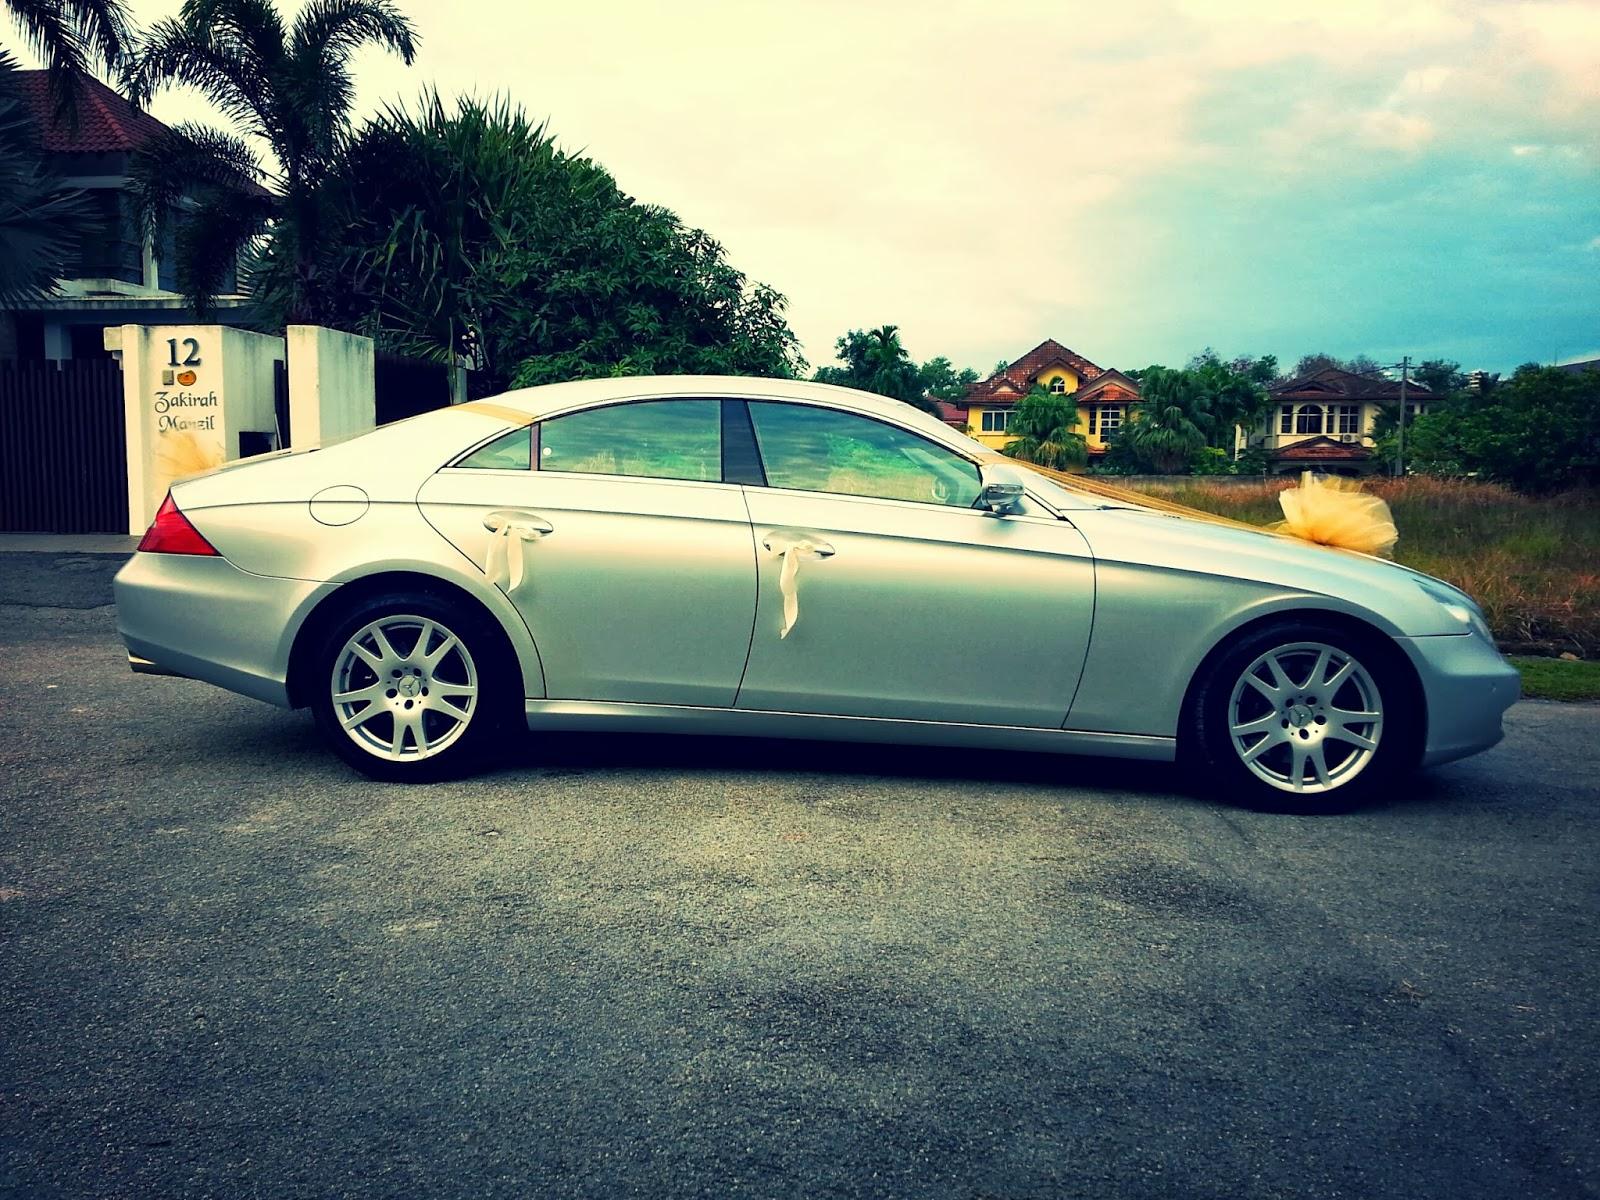 Redorca malaysia wedding and event car rental mercedes for Mercedes benz car rental